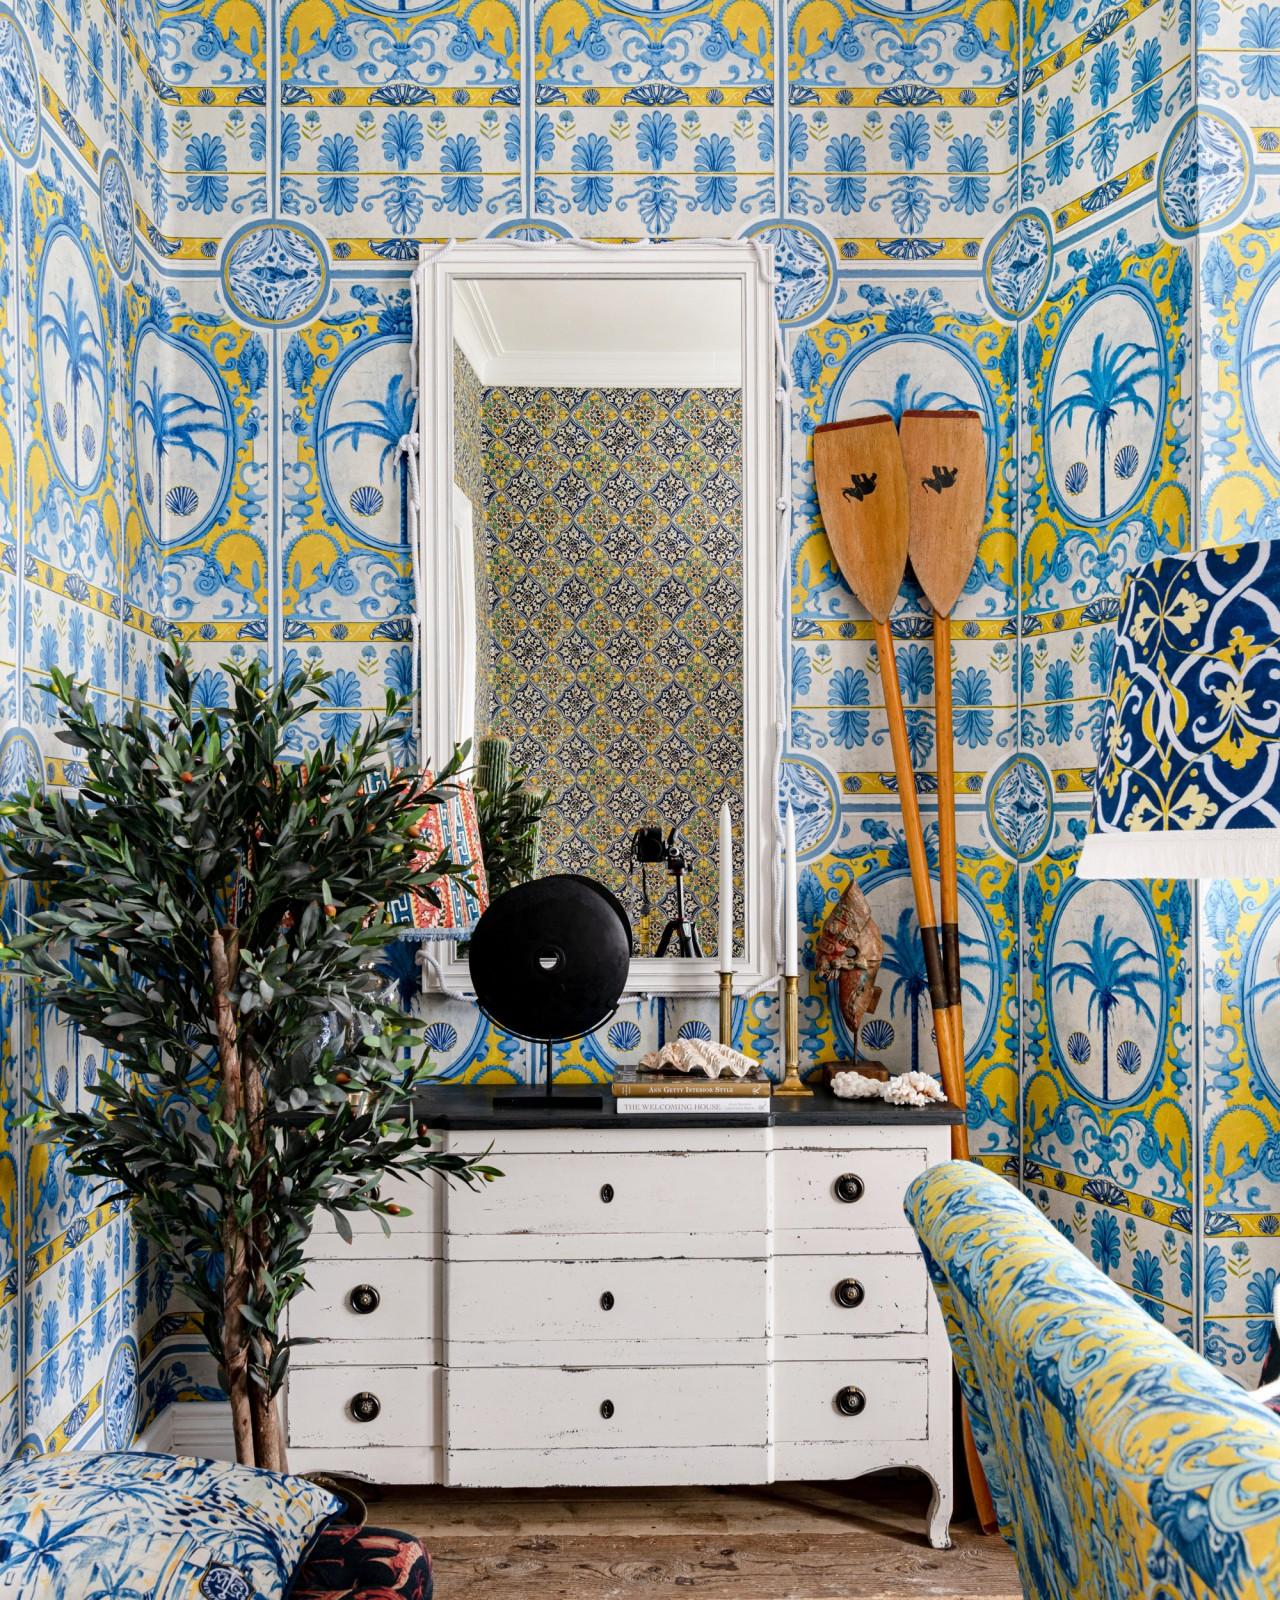 THE VILLA Mural Yellow Wallpaper